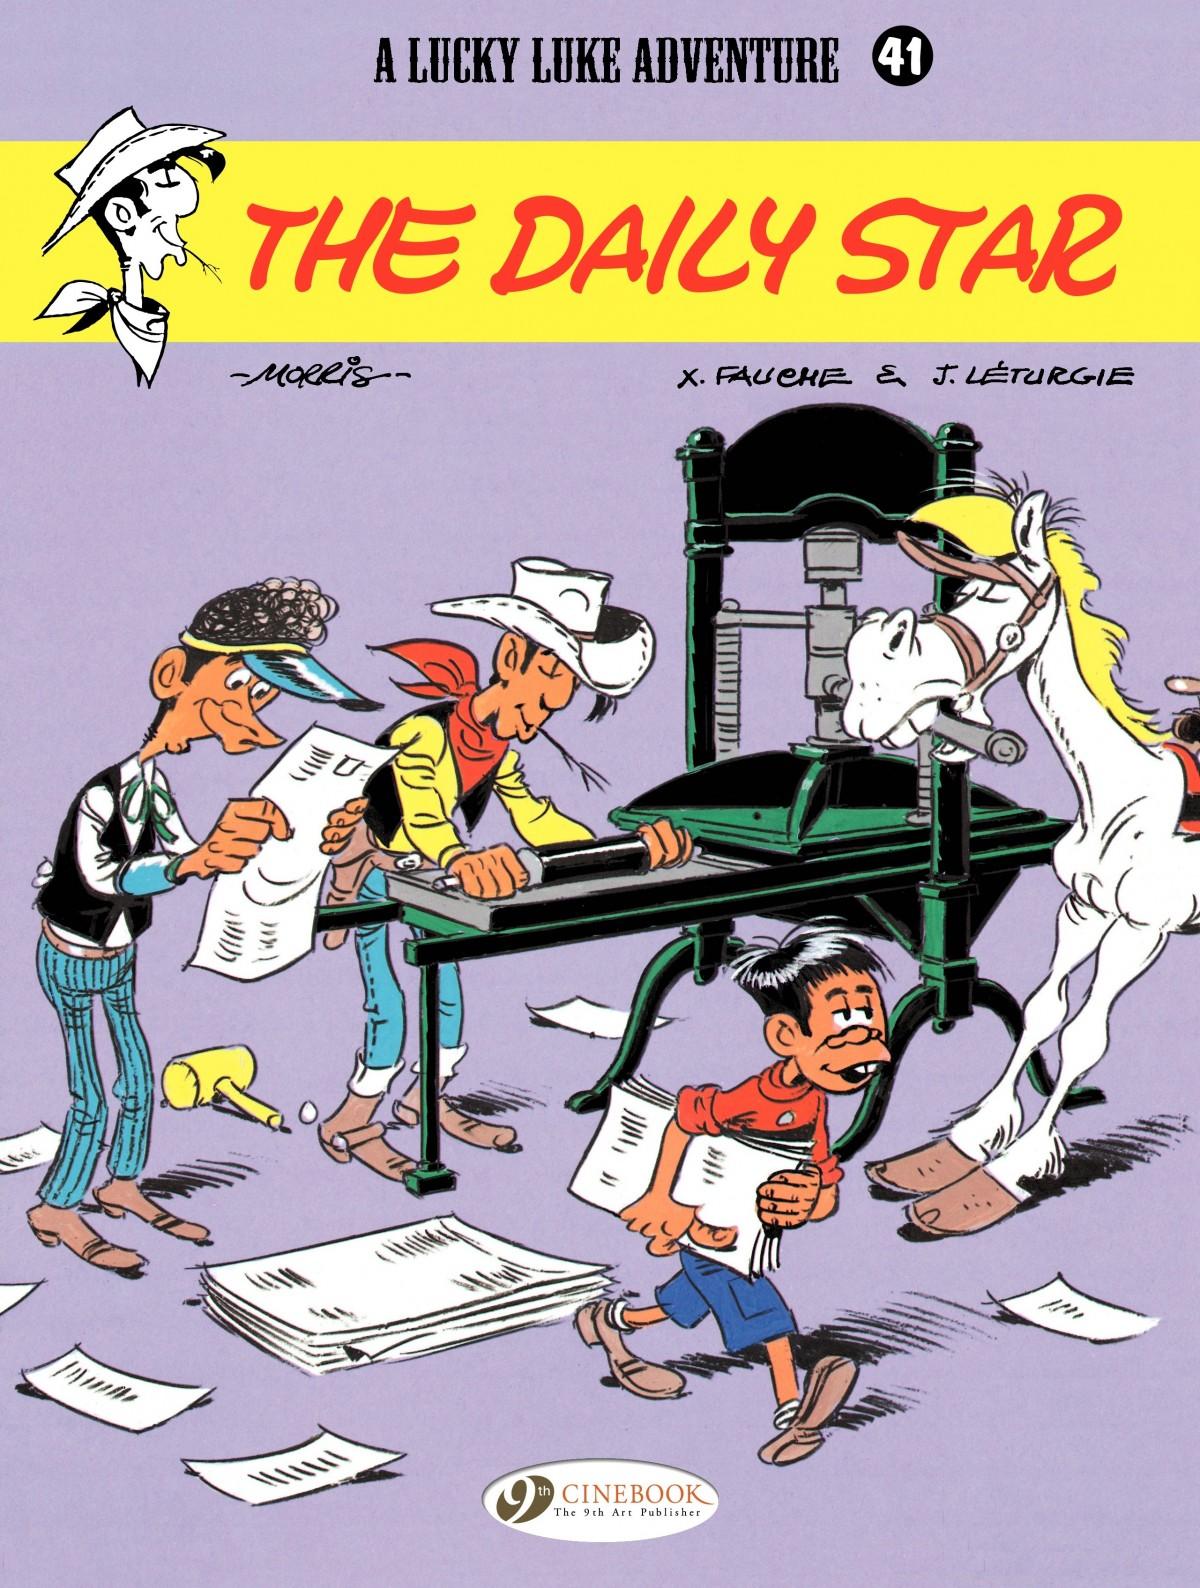 Read online A Lucky Luke Adventure comic -  Issue #41 - 1